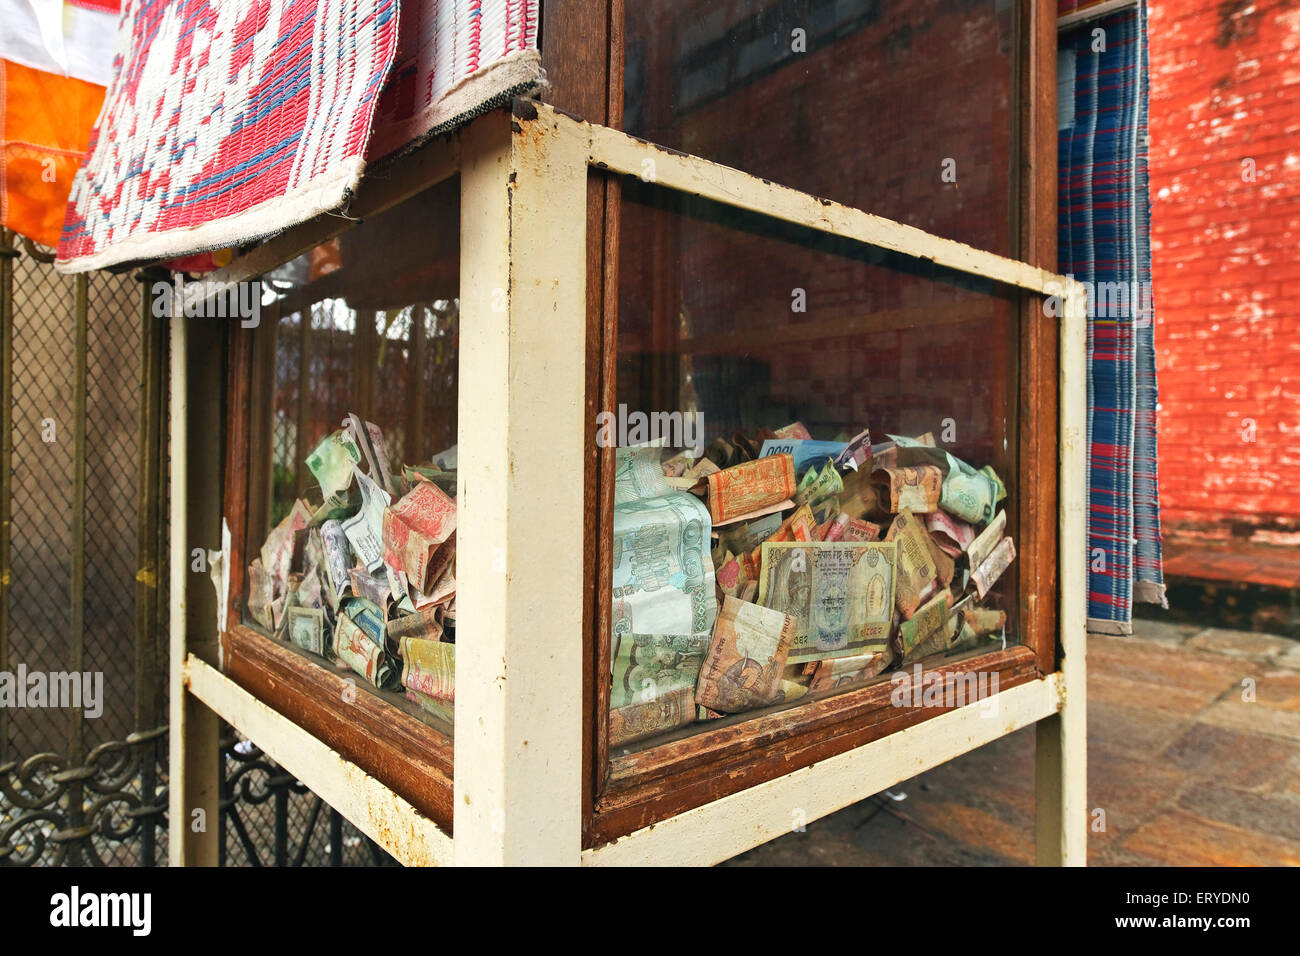 Donation box ; UNESCO World Heritage site ; Gautam Buddha's birthplace at Lumbini ; Nepal - Stock Image